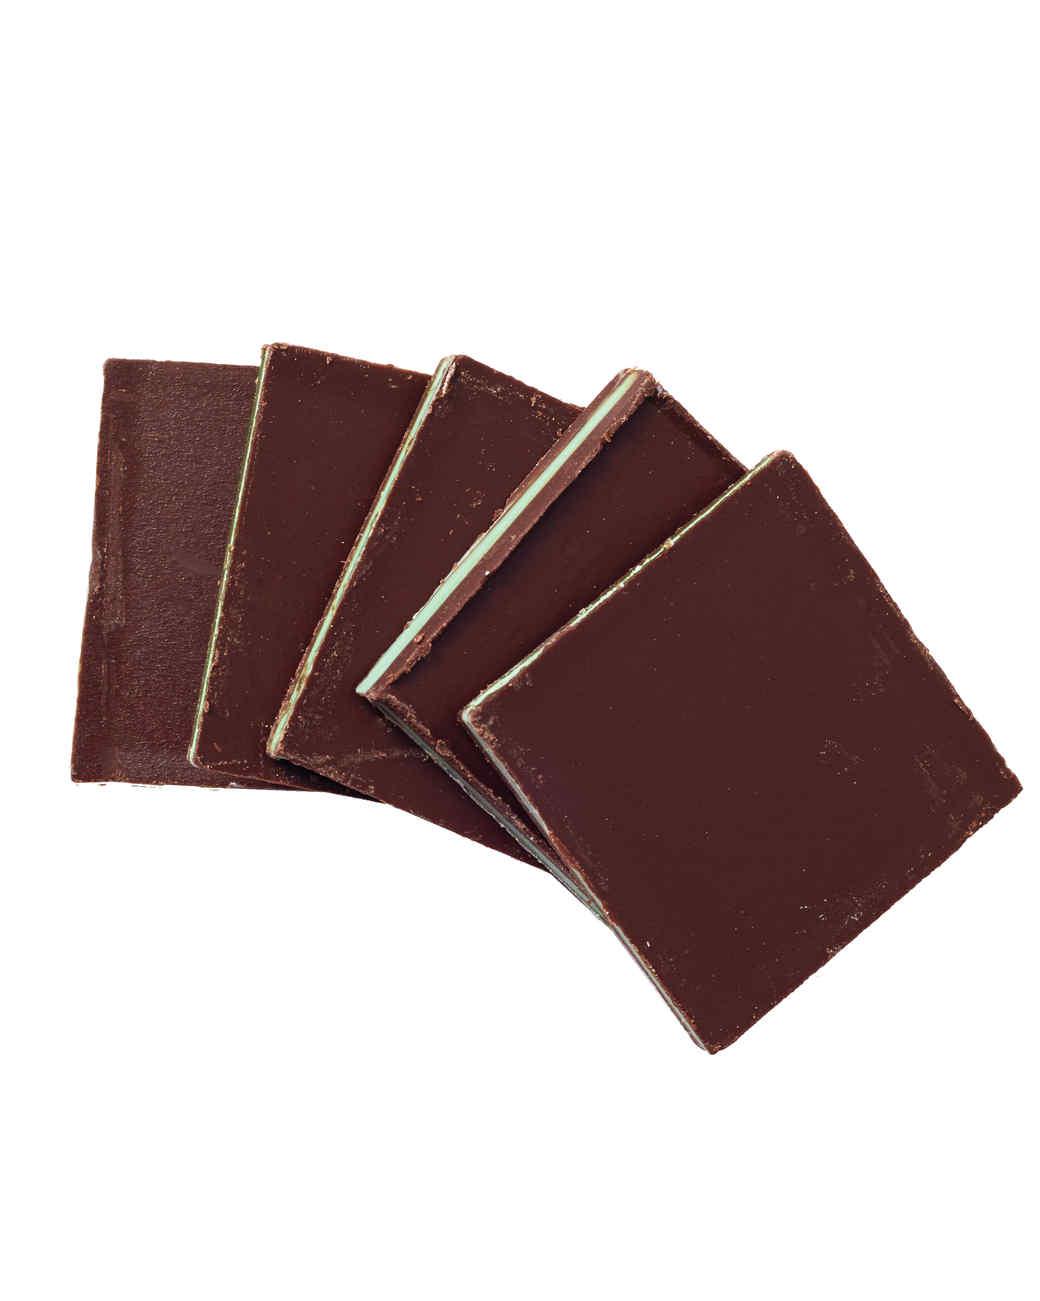 mint-chocolates-104-d111355.jpg